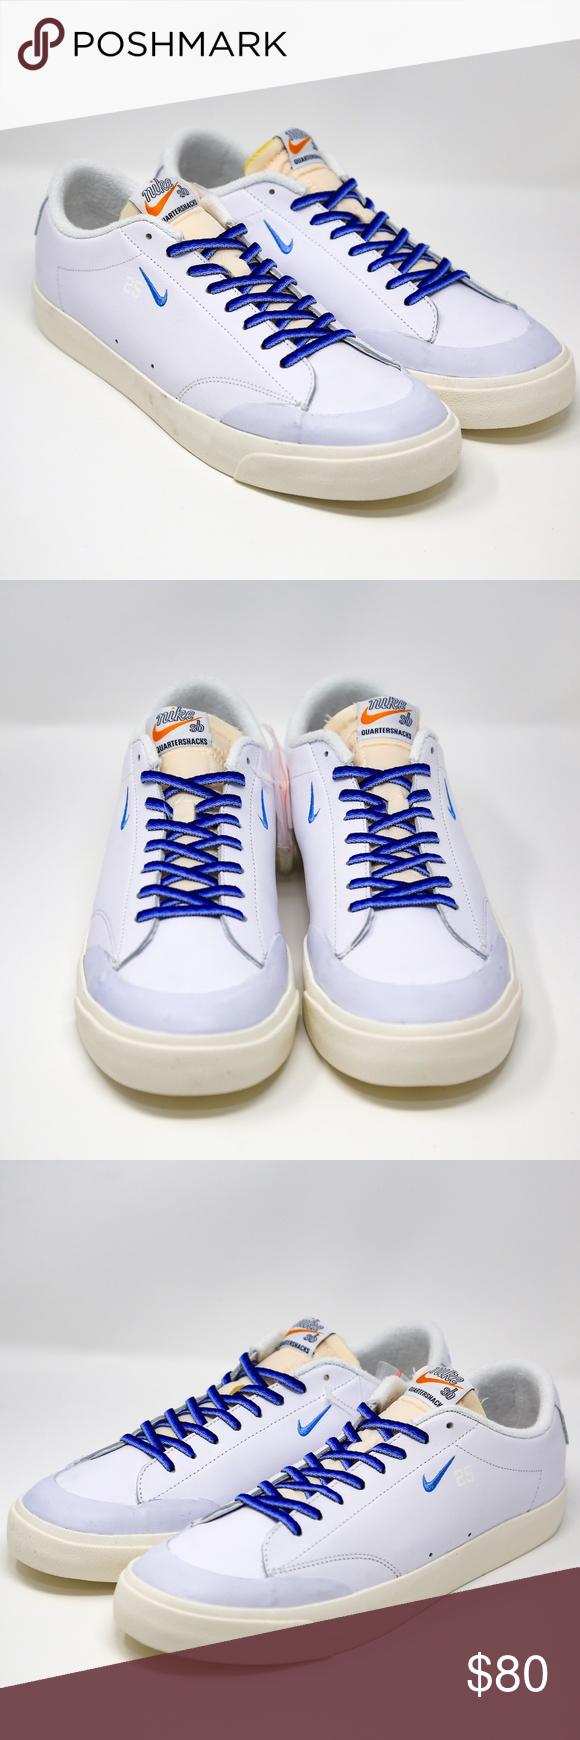 Nike Sb Zoom Blazer Low Xt Qs Quartersnacks 11 5 Nike Sb Zoom Blazer Low Xt Quartersnacks Qs Skate Board Shoes Mpn Sty Nike Sb Clothes Design University Blue